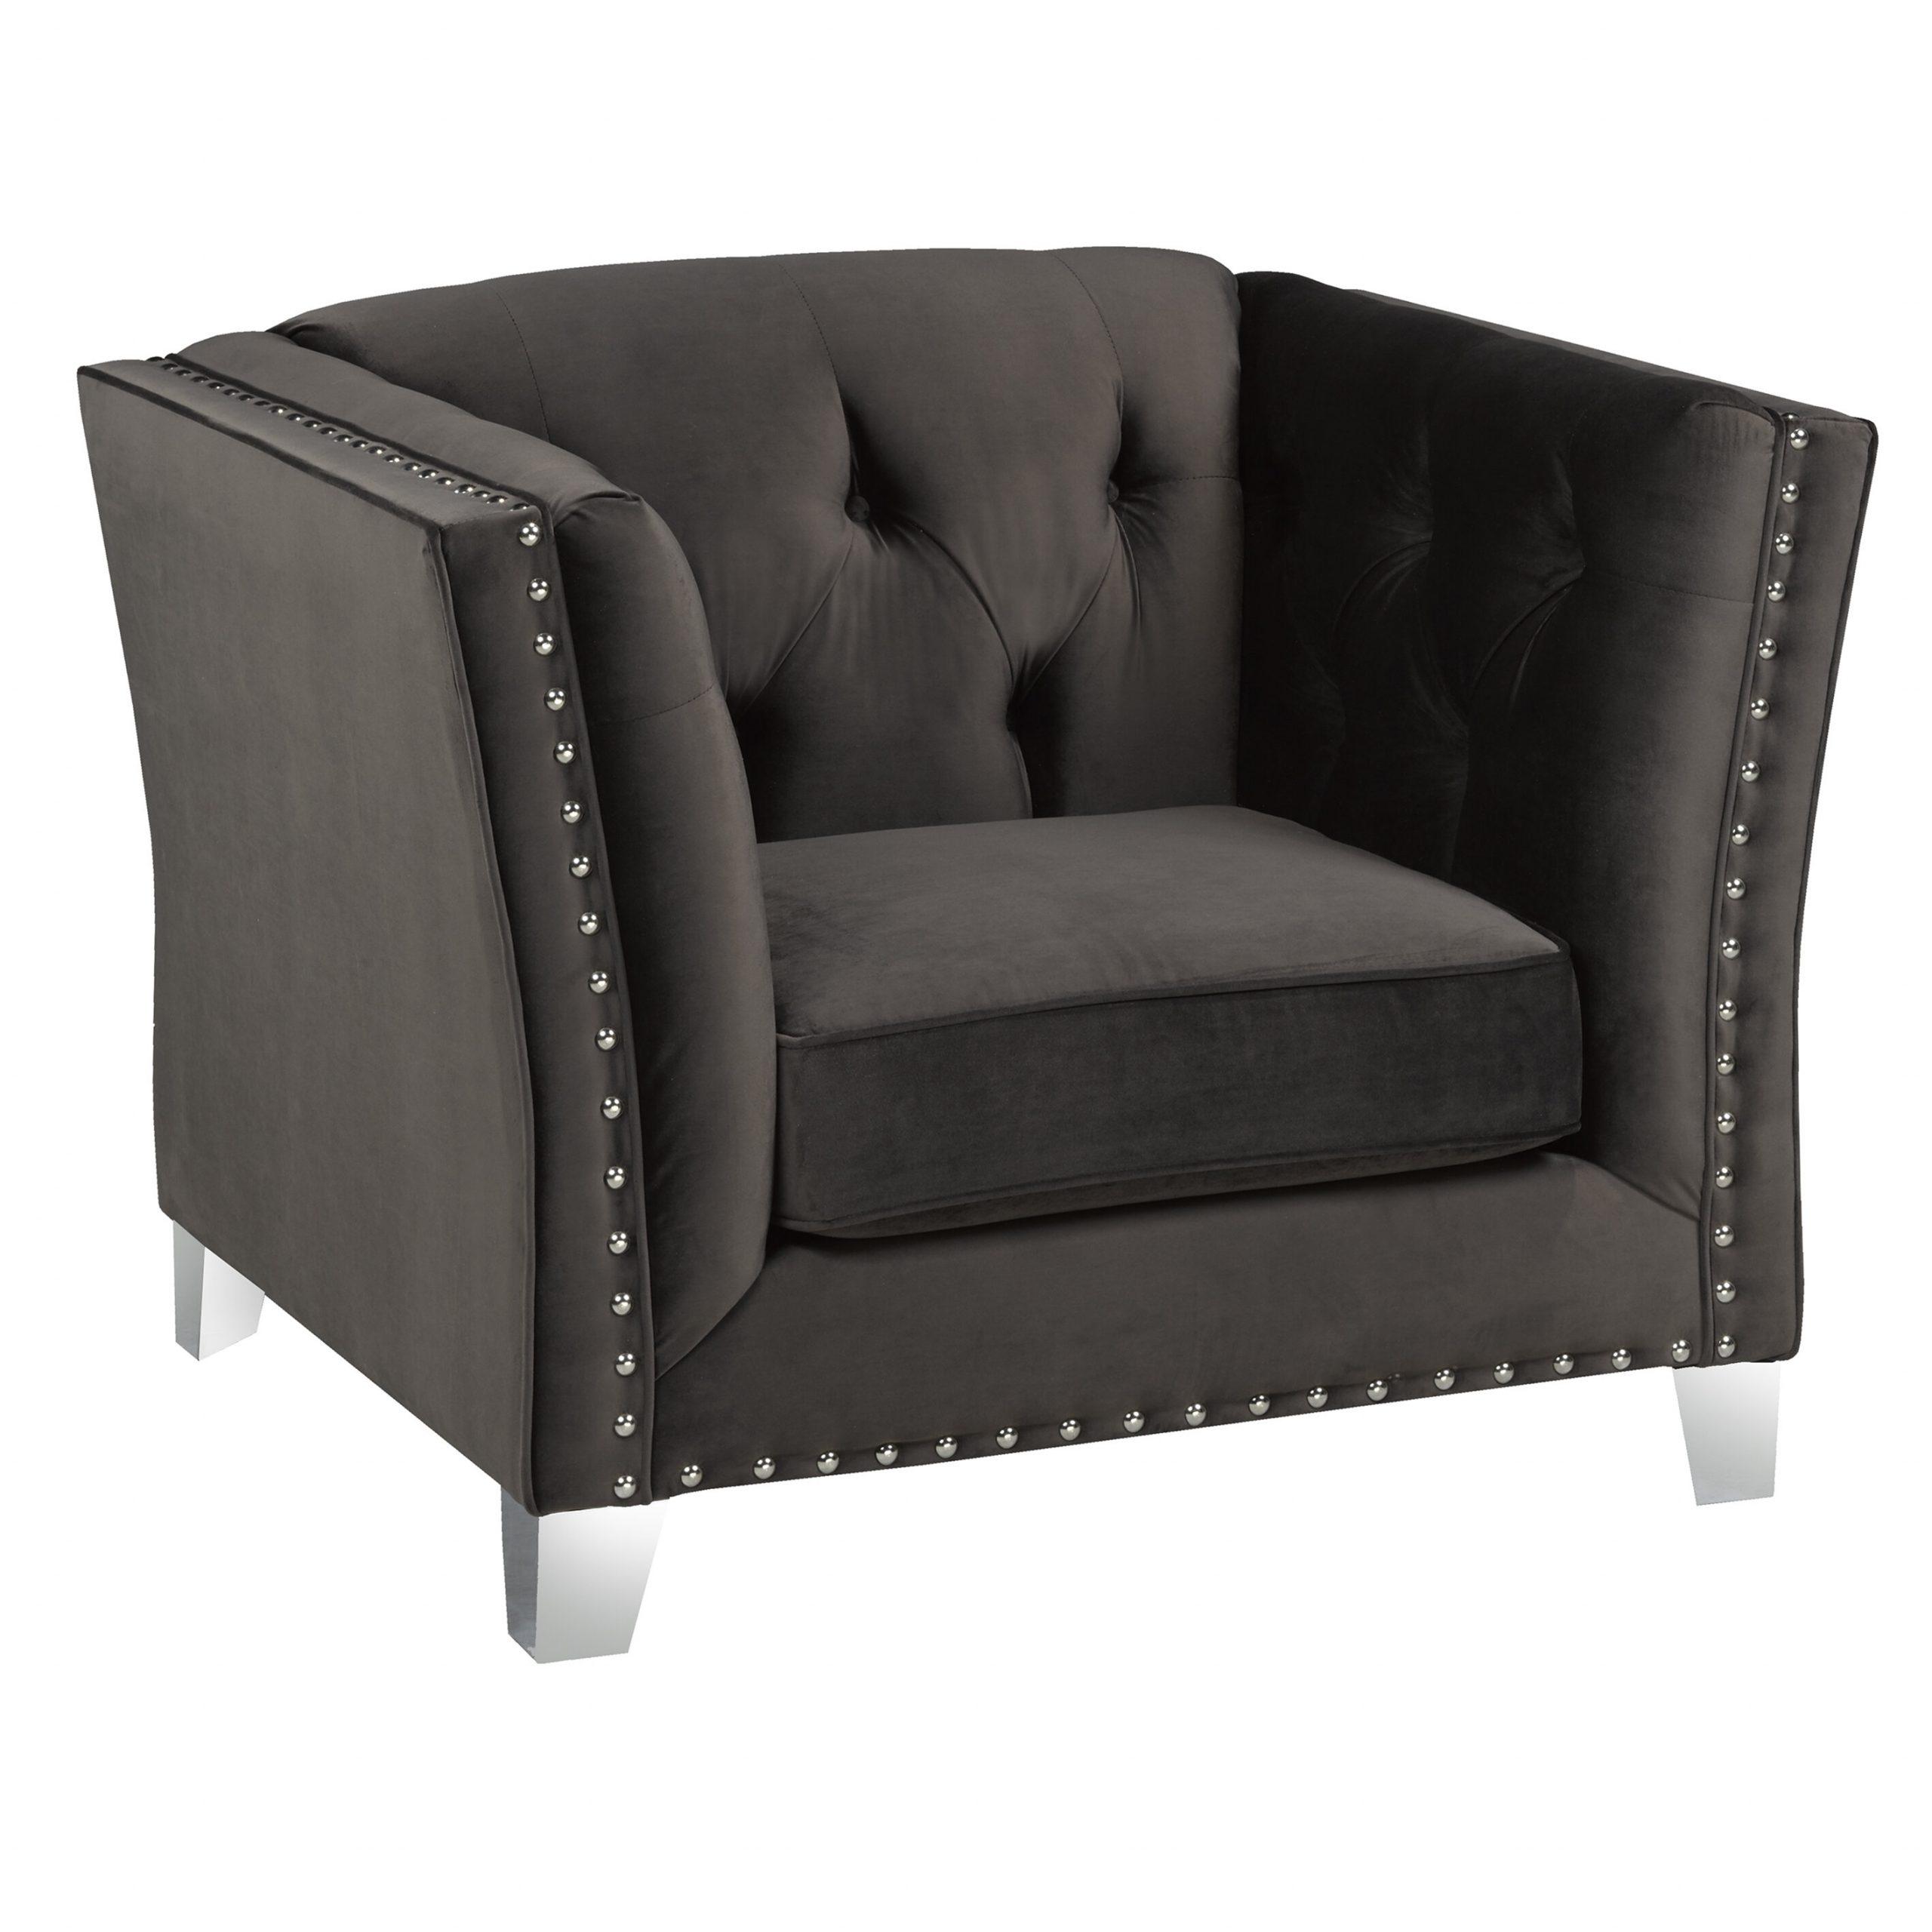 "Shept Mallet 41"" W Tufted Velvet Armchair With Regard To Didonato Tufted Velvet Armchairs (View 8 of 15)"